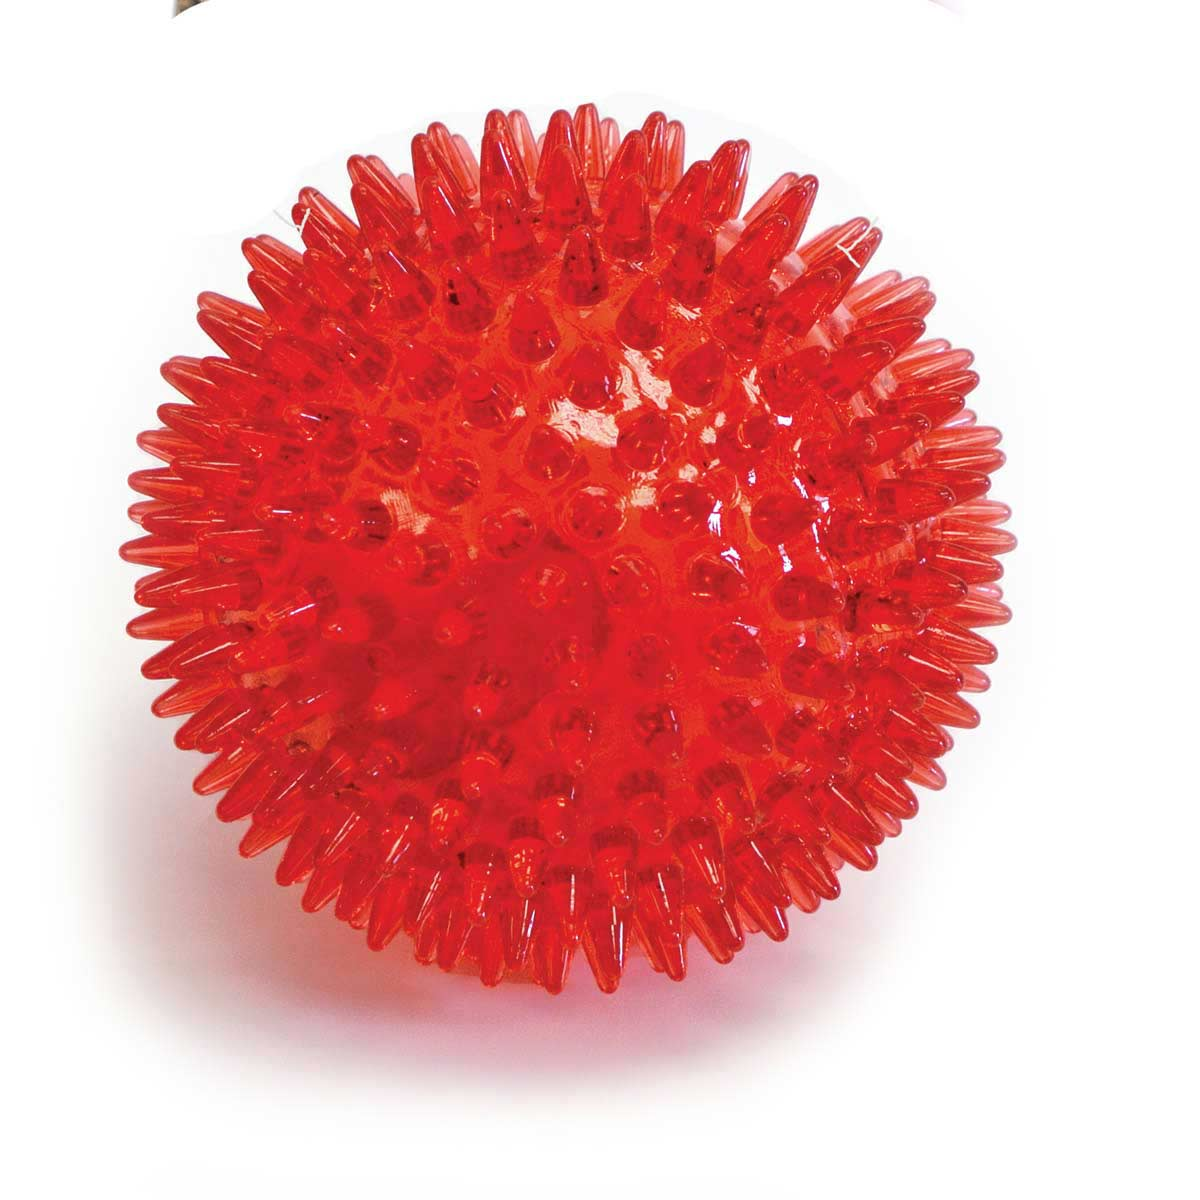 Gnawsome 3.5 inch Spikey Squeaker Ball Dog Toy